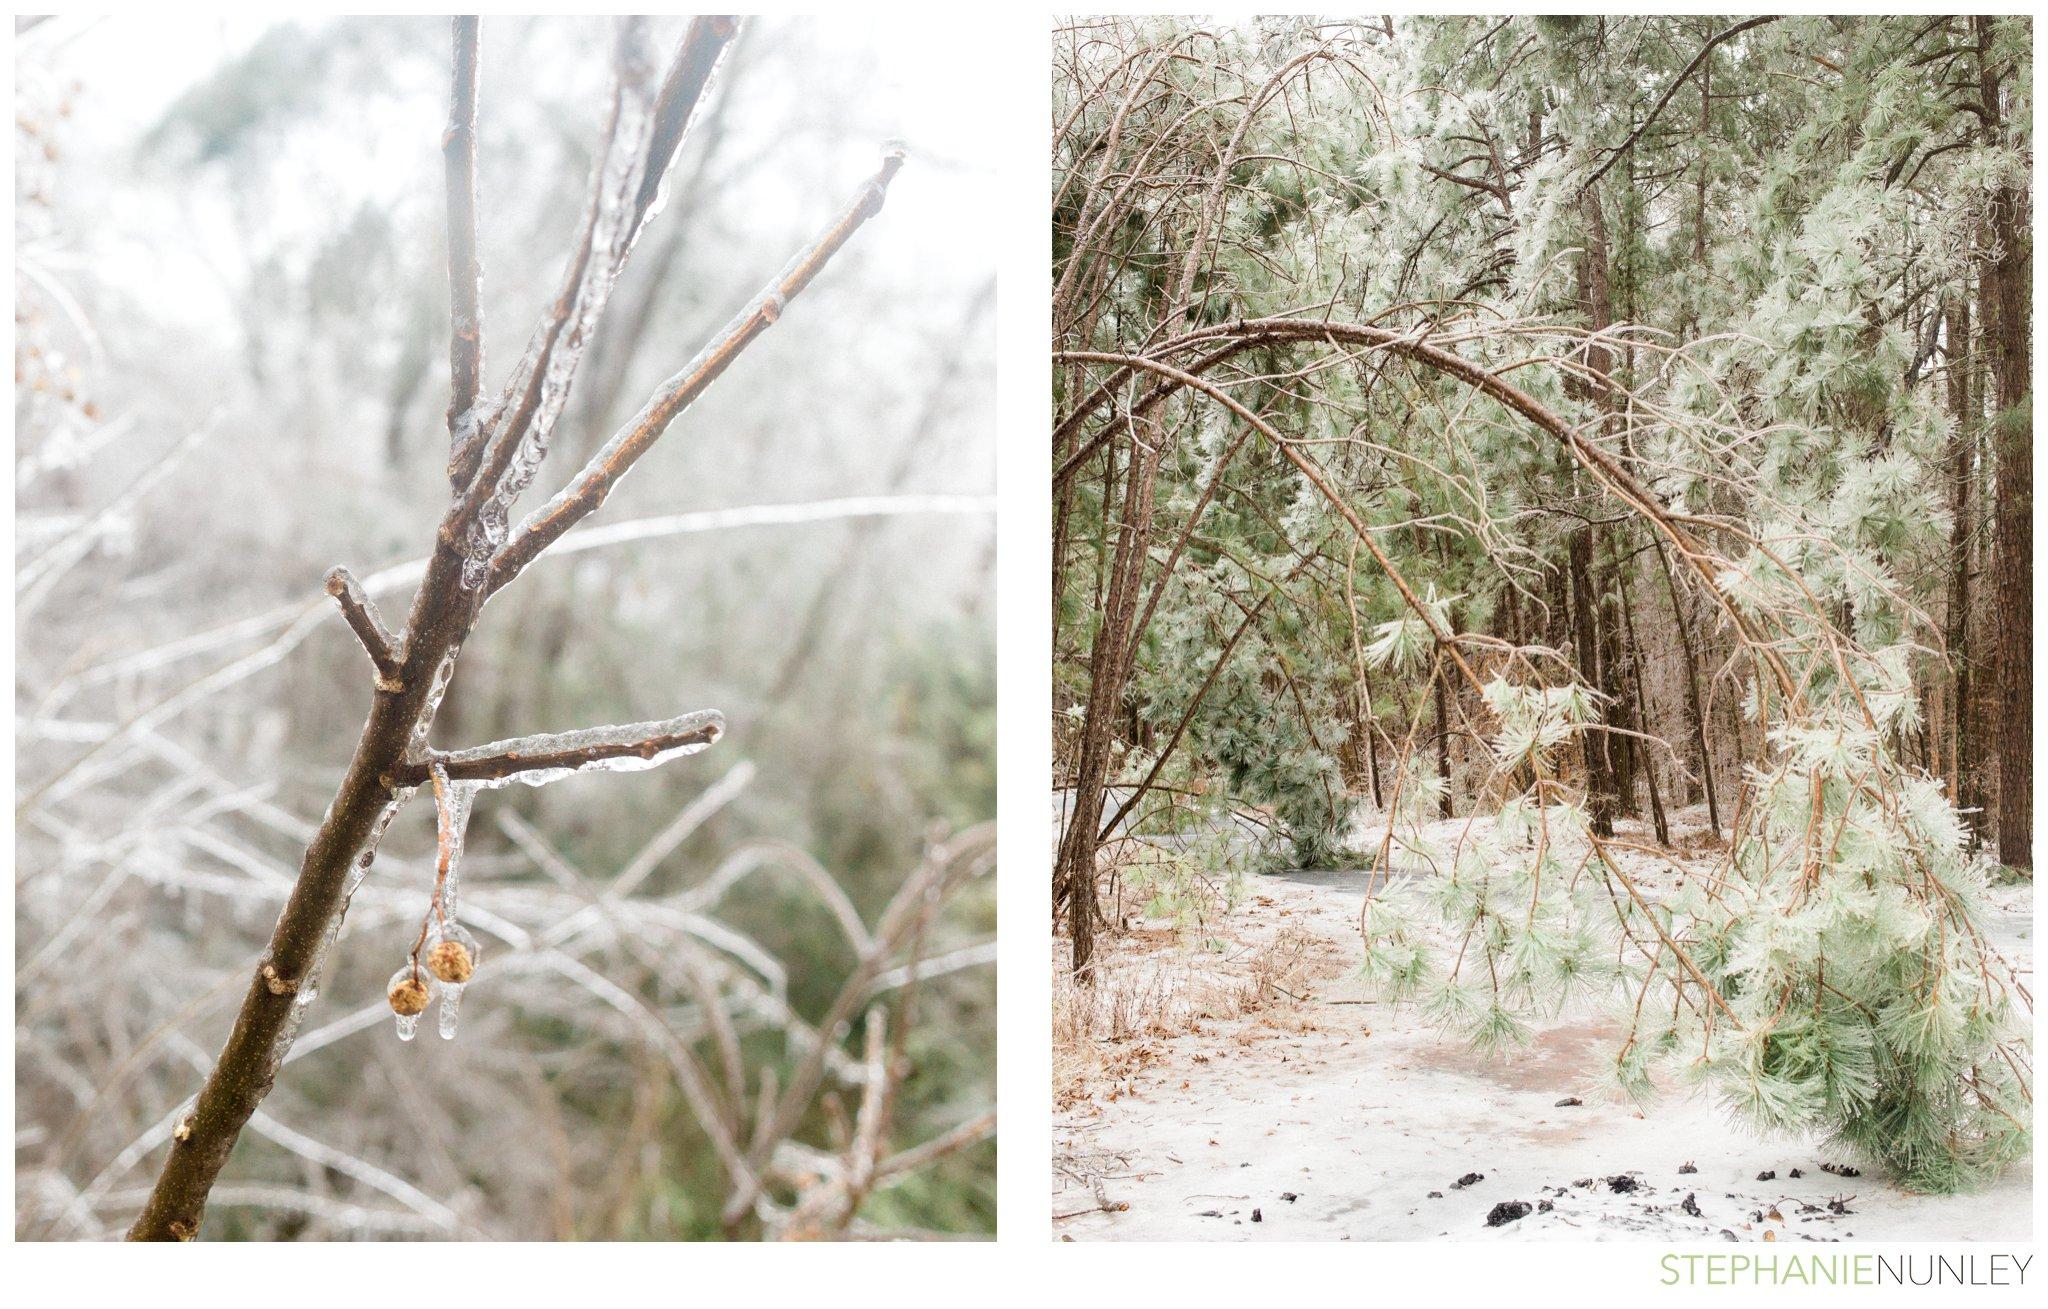 arkansas-winter-scenery-001.jpg